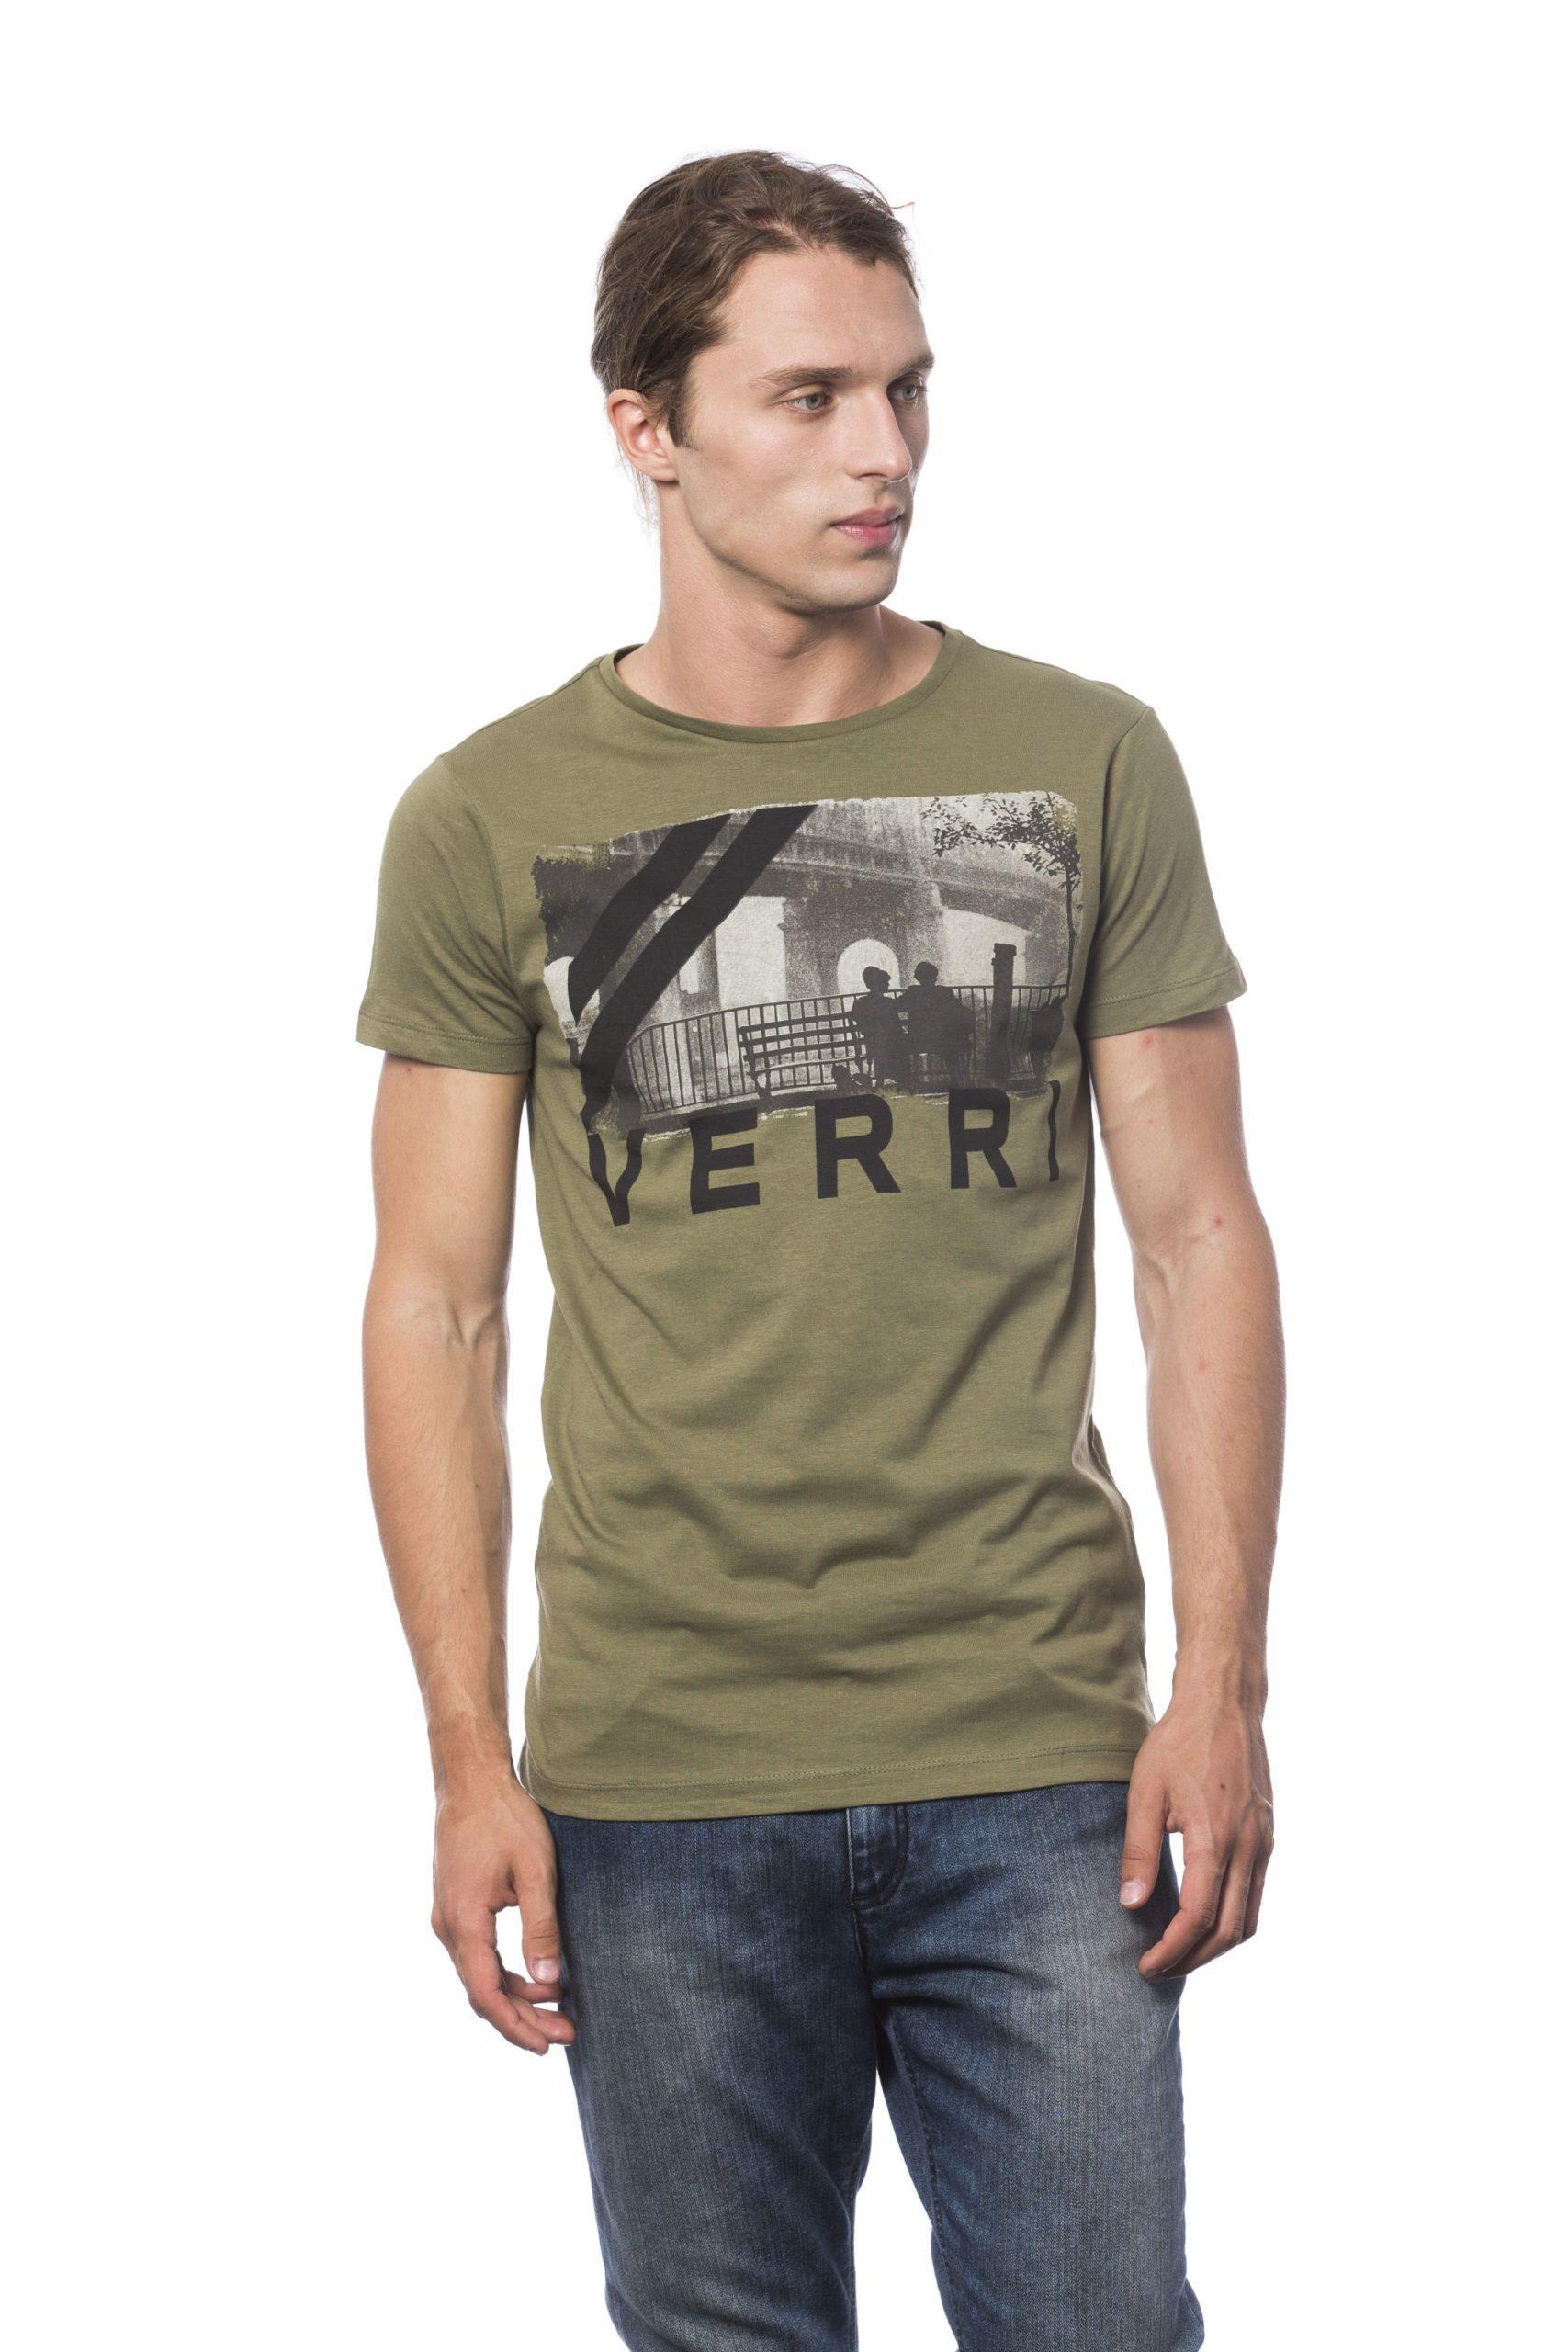 Verri Men's Army T-Shirt Gray VE682813 - S